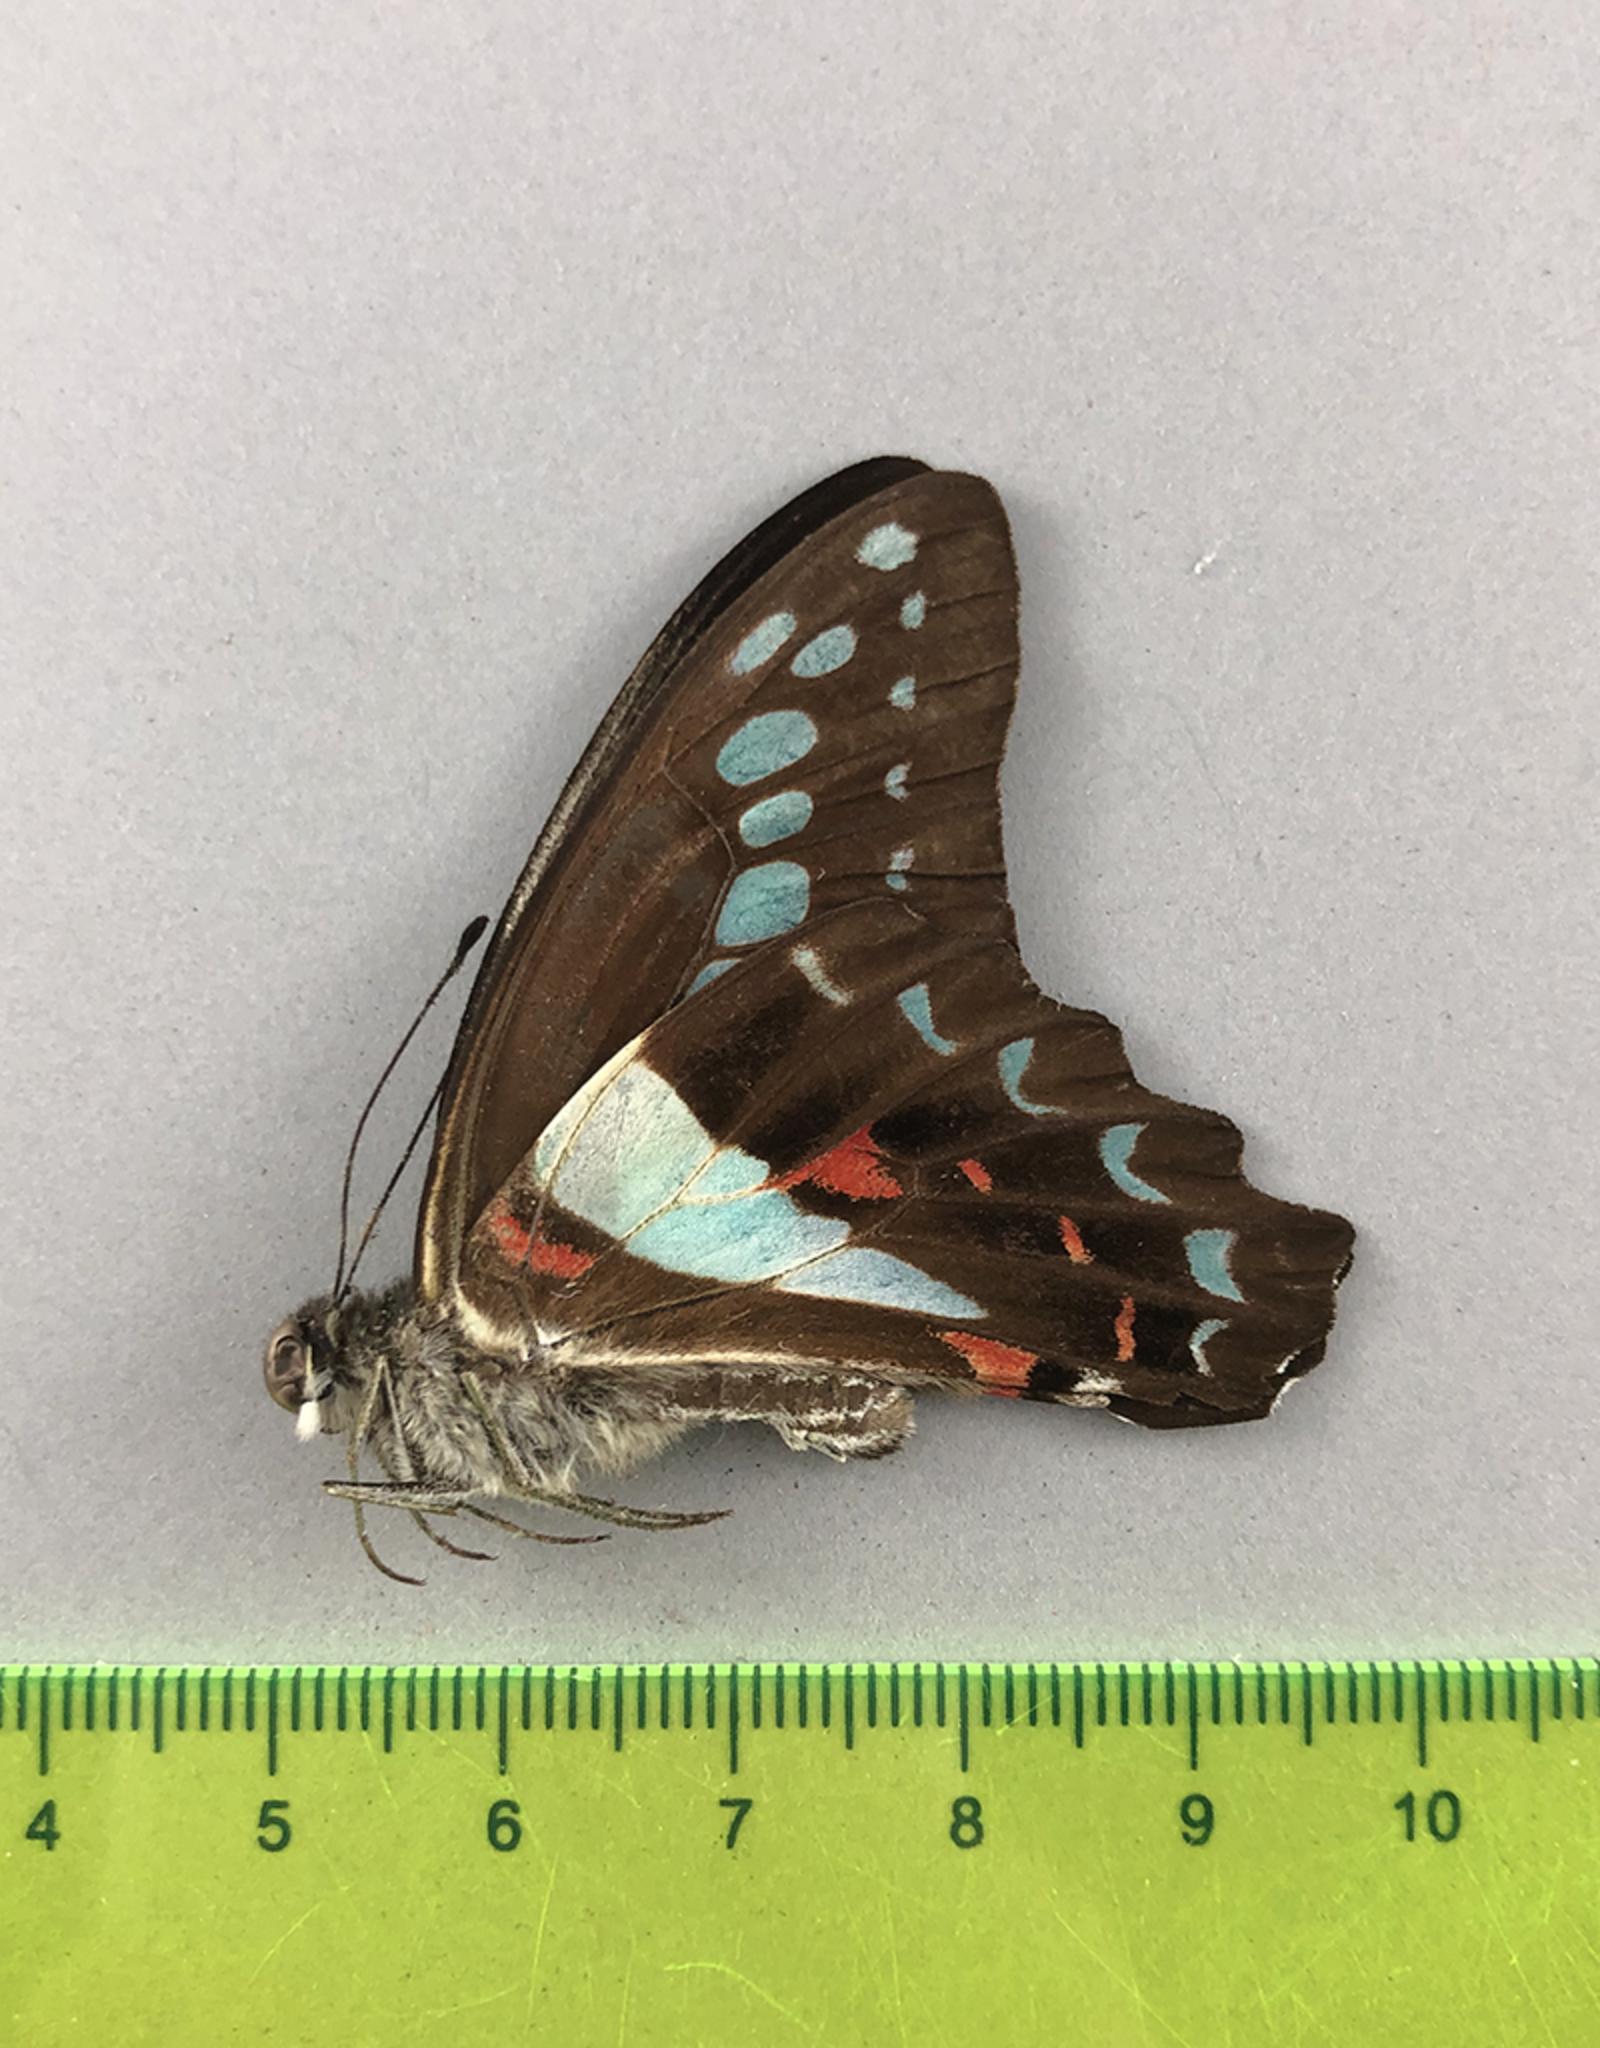 Papilio sarpedon messogis M A1- South Bougainville, Papua New Guinea